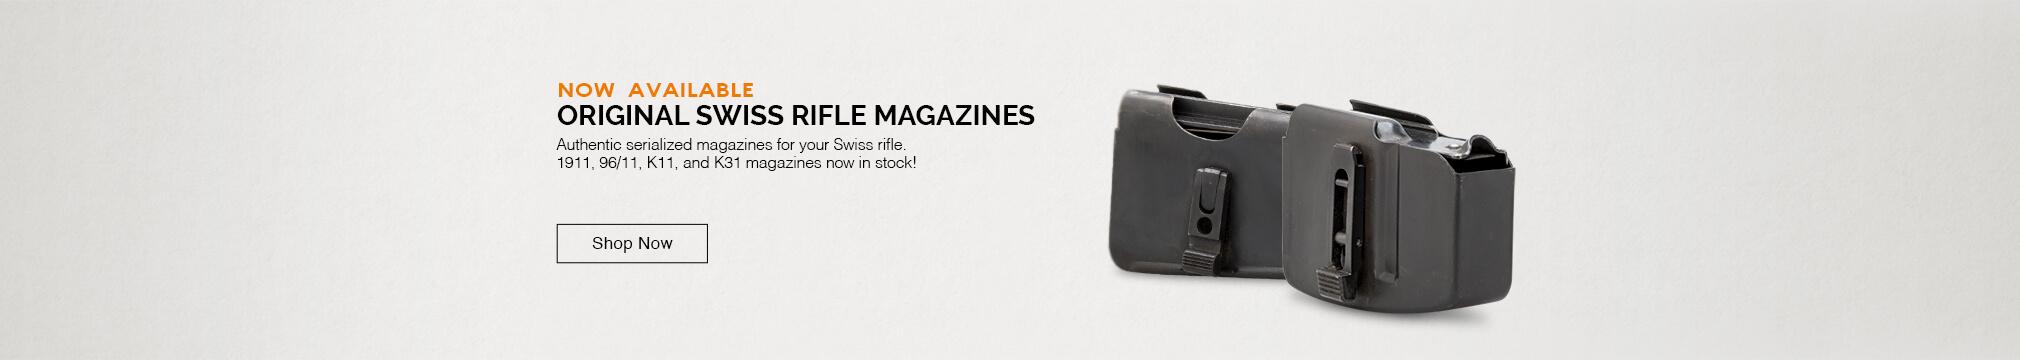 Swiss rifle magazines